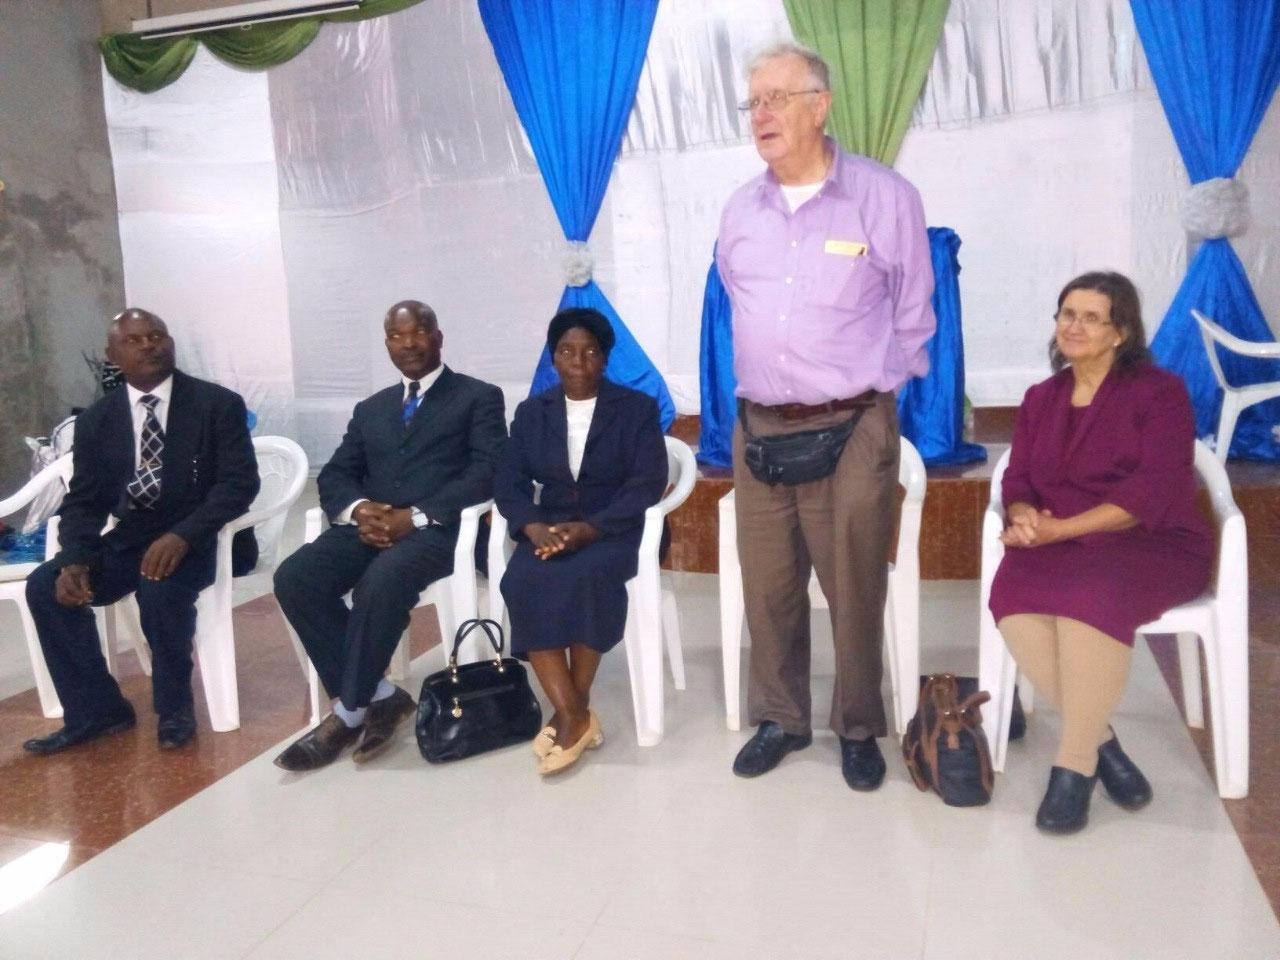 Welcoming presentation in Luanda